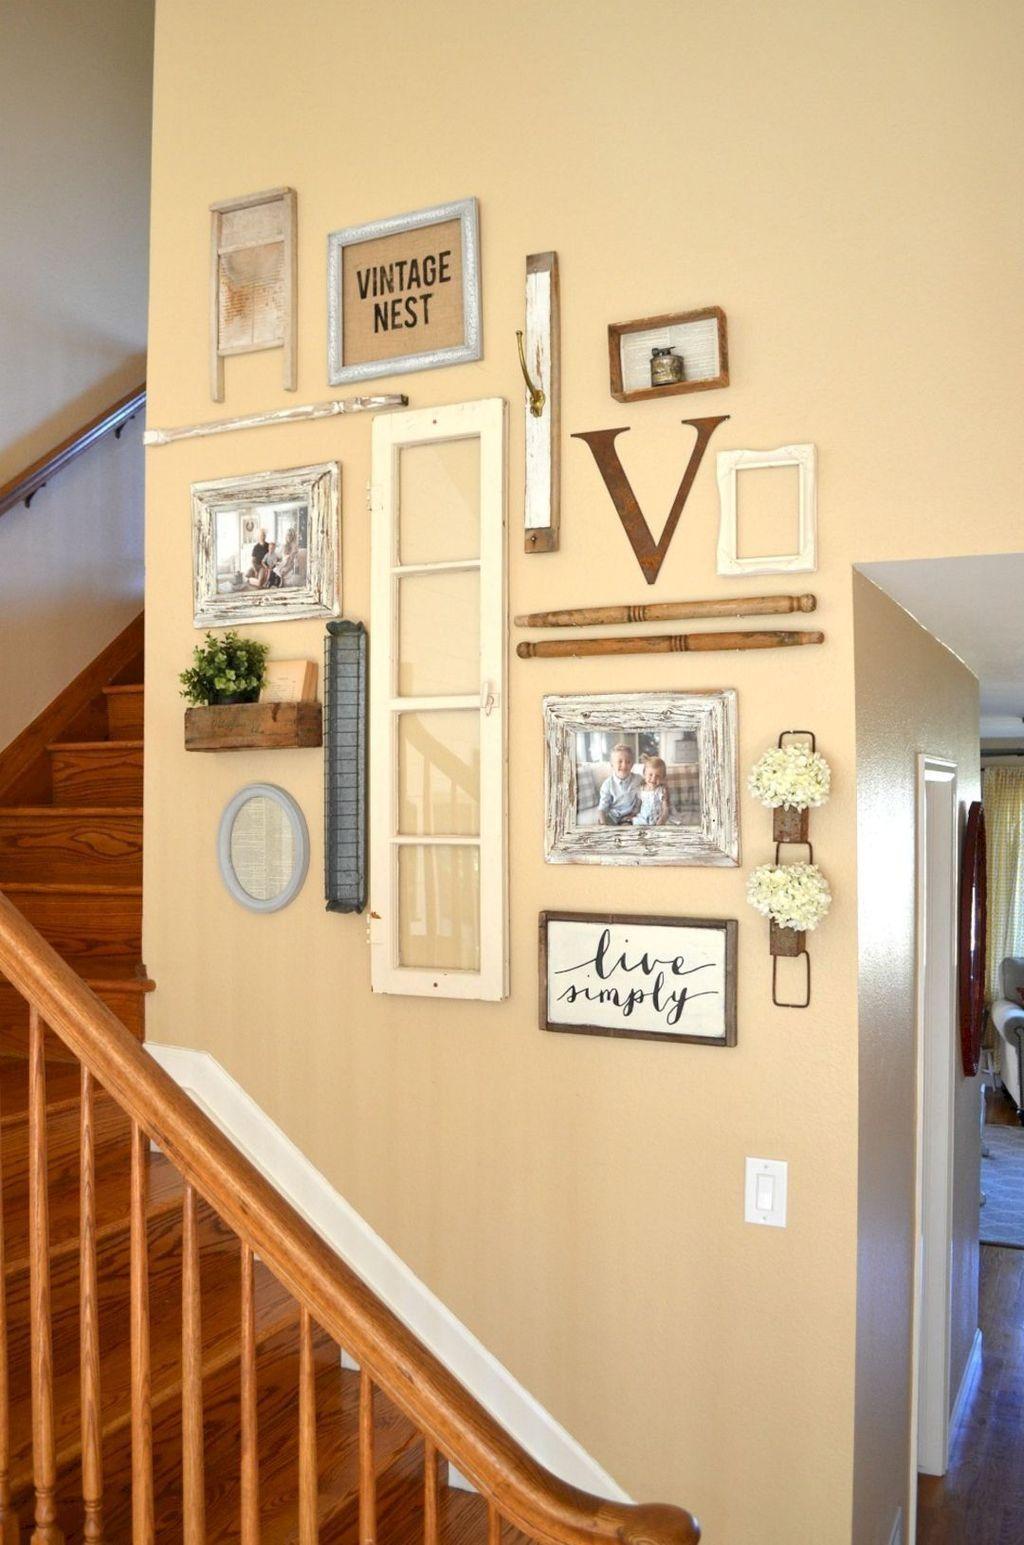 51 Elegant Galery Wall Decorating Ideas For Bedroom | Pinterest ...